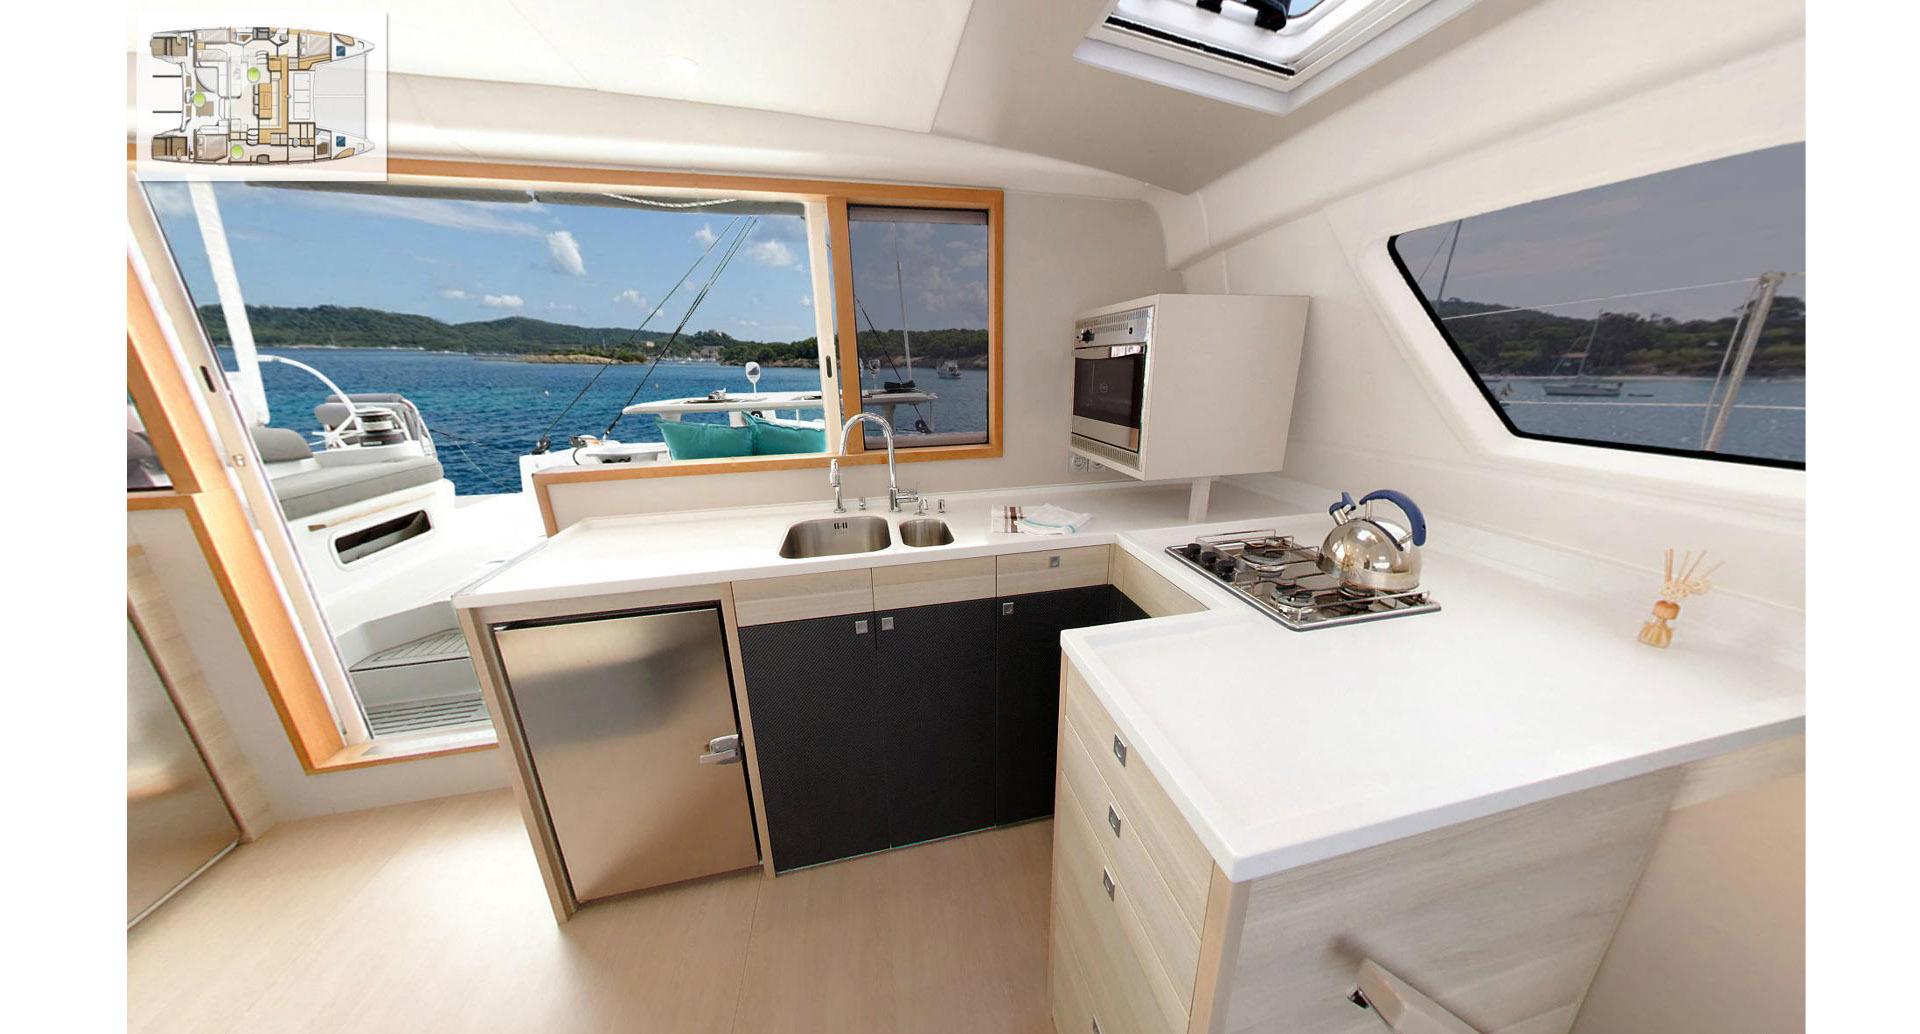 catana 47 herve couedel yacht designer muzillac sarzeau. Black Bedroom Furniture Sets. Home Design Ideas